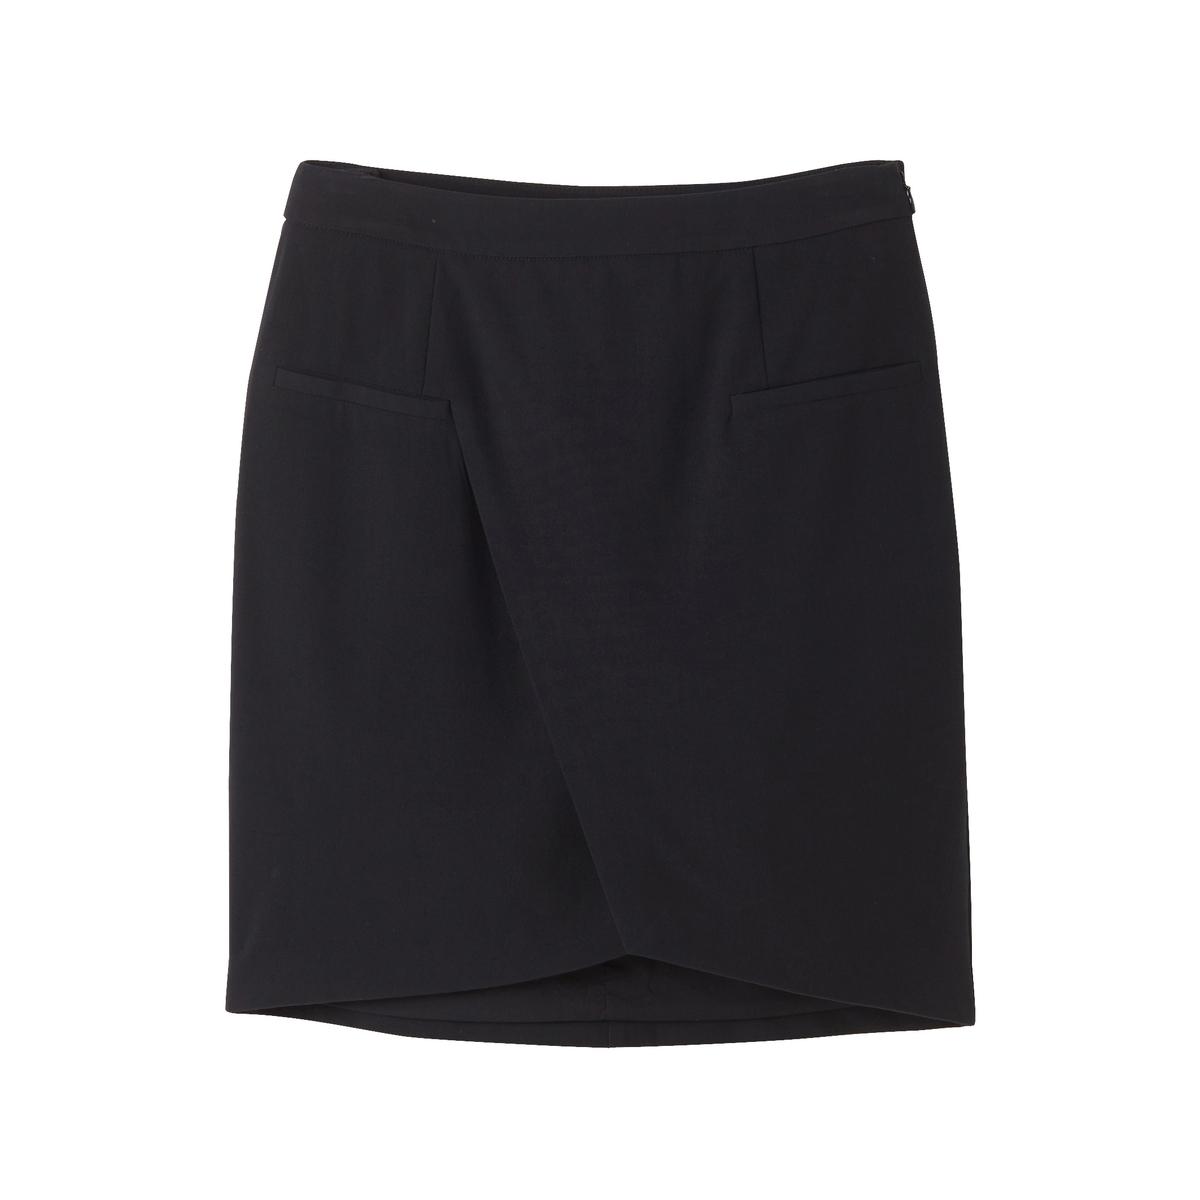 Юбка короткая с запахом lacywear юбка u 33 svm